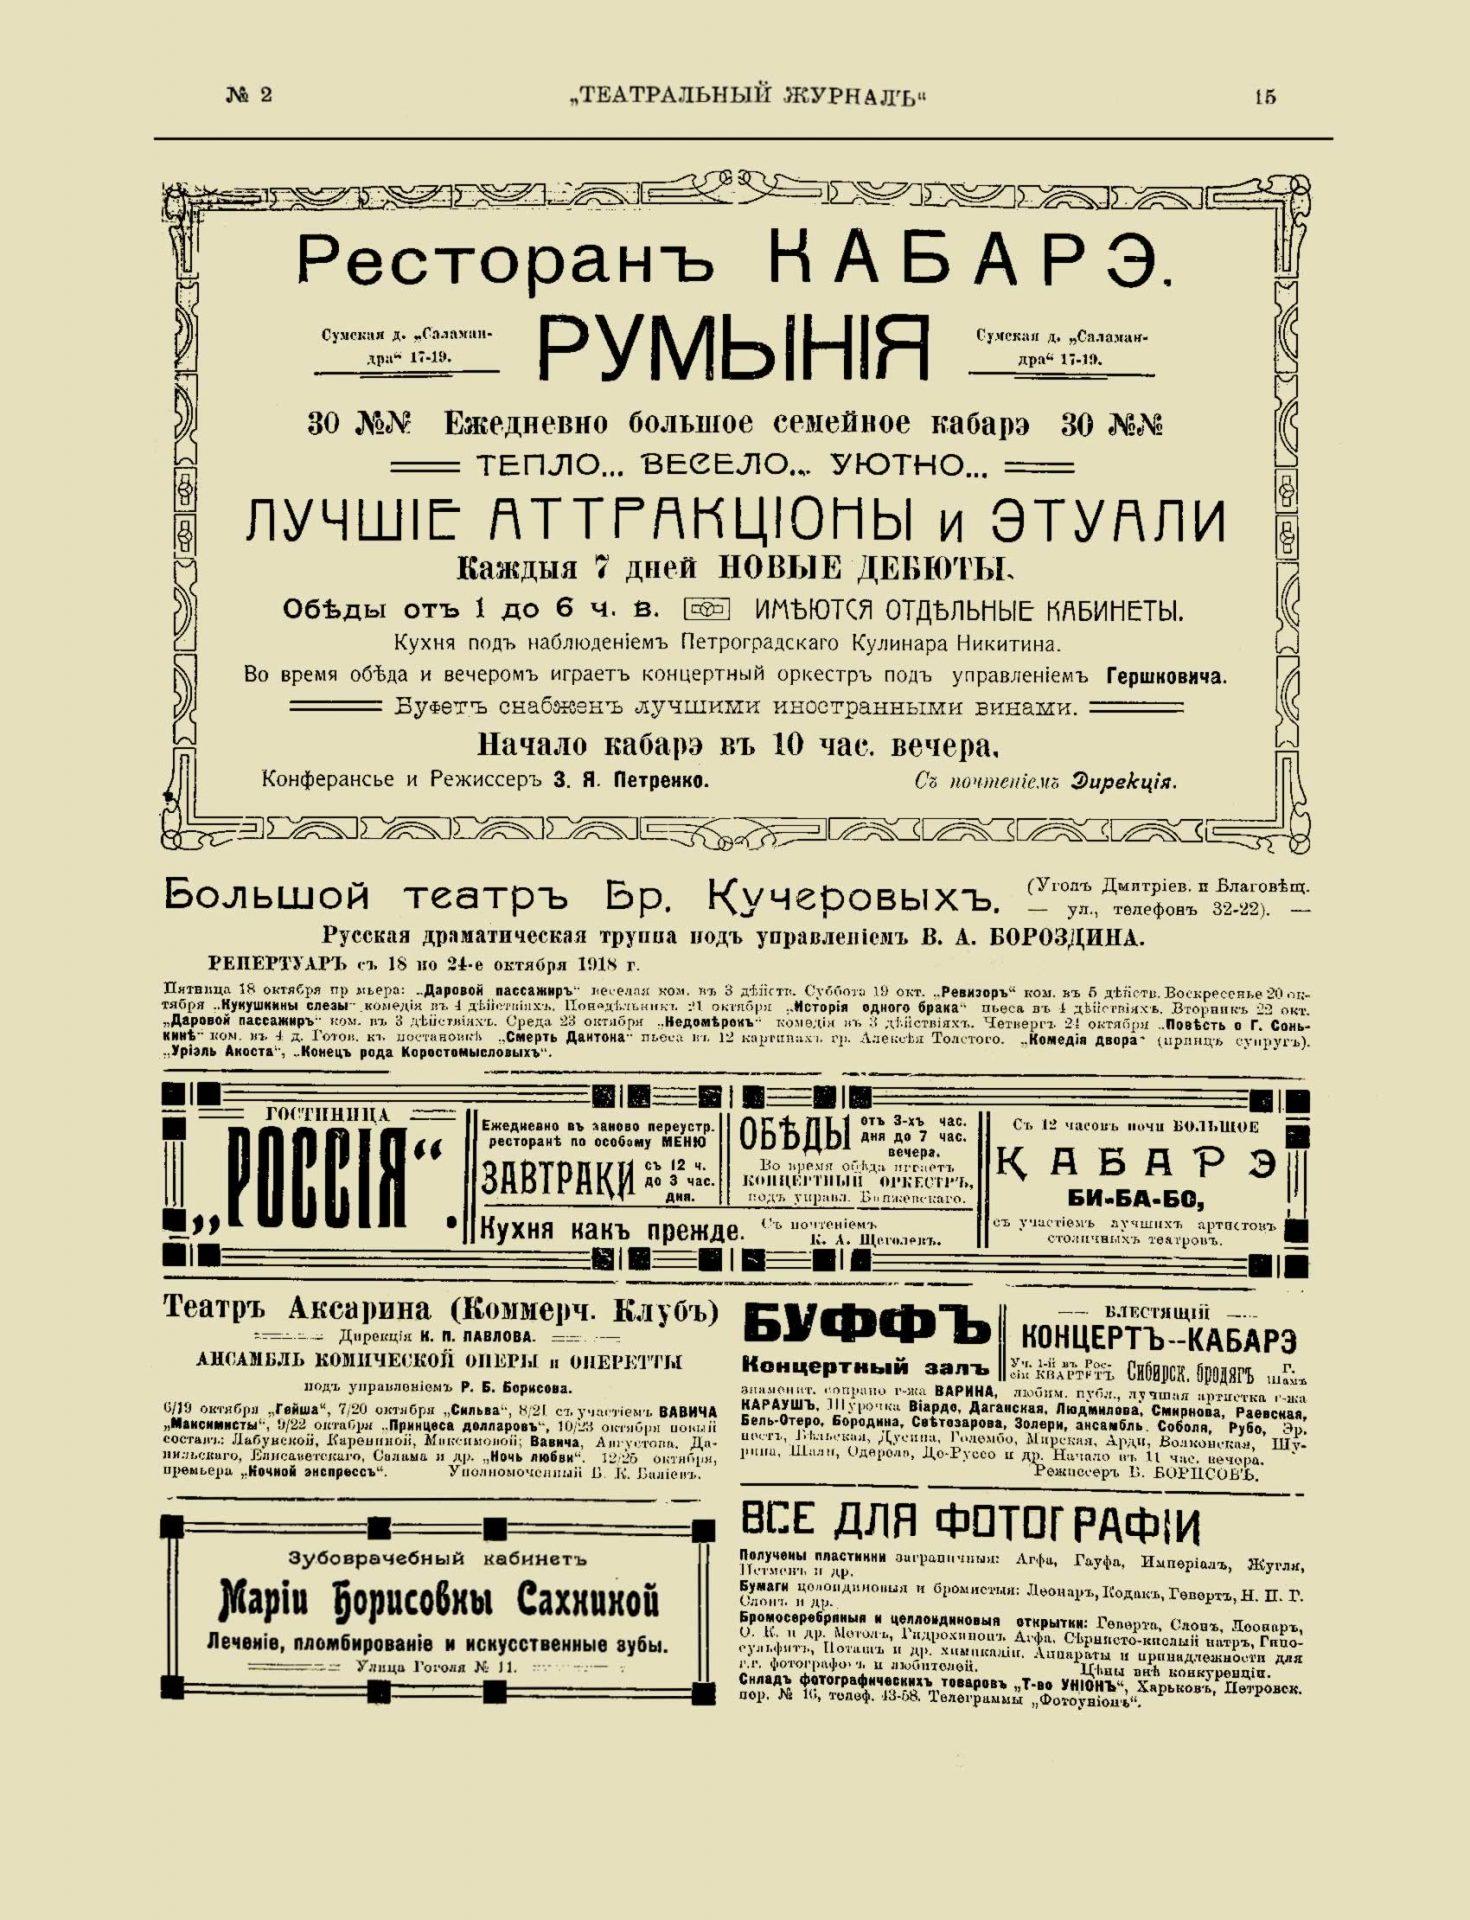 Театральный журнал_1918_№2